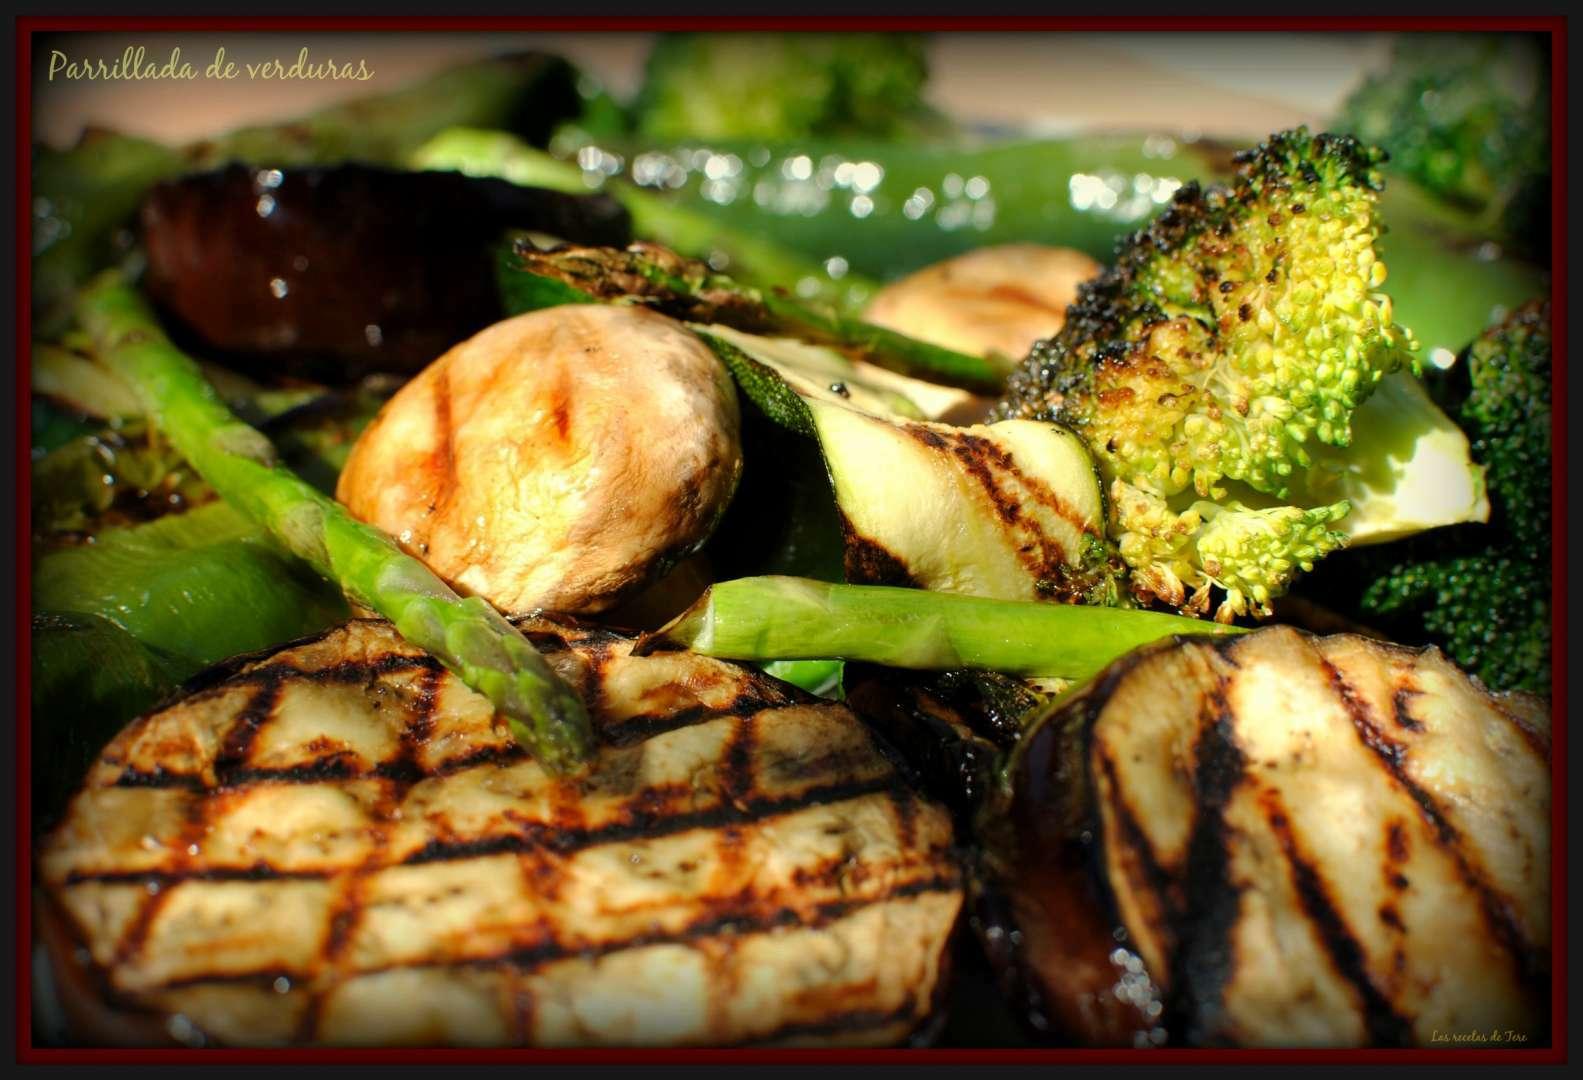 Parrillada de verduras receta petitchef for Parrillada verduras